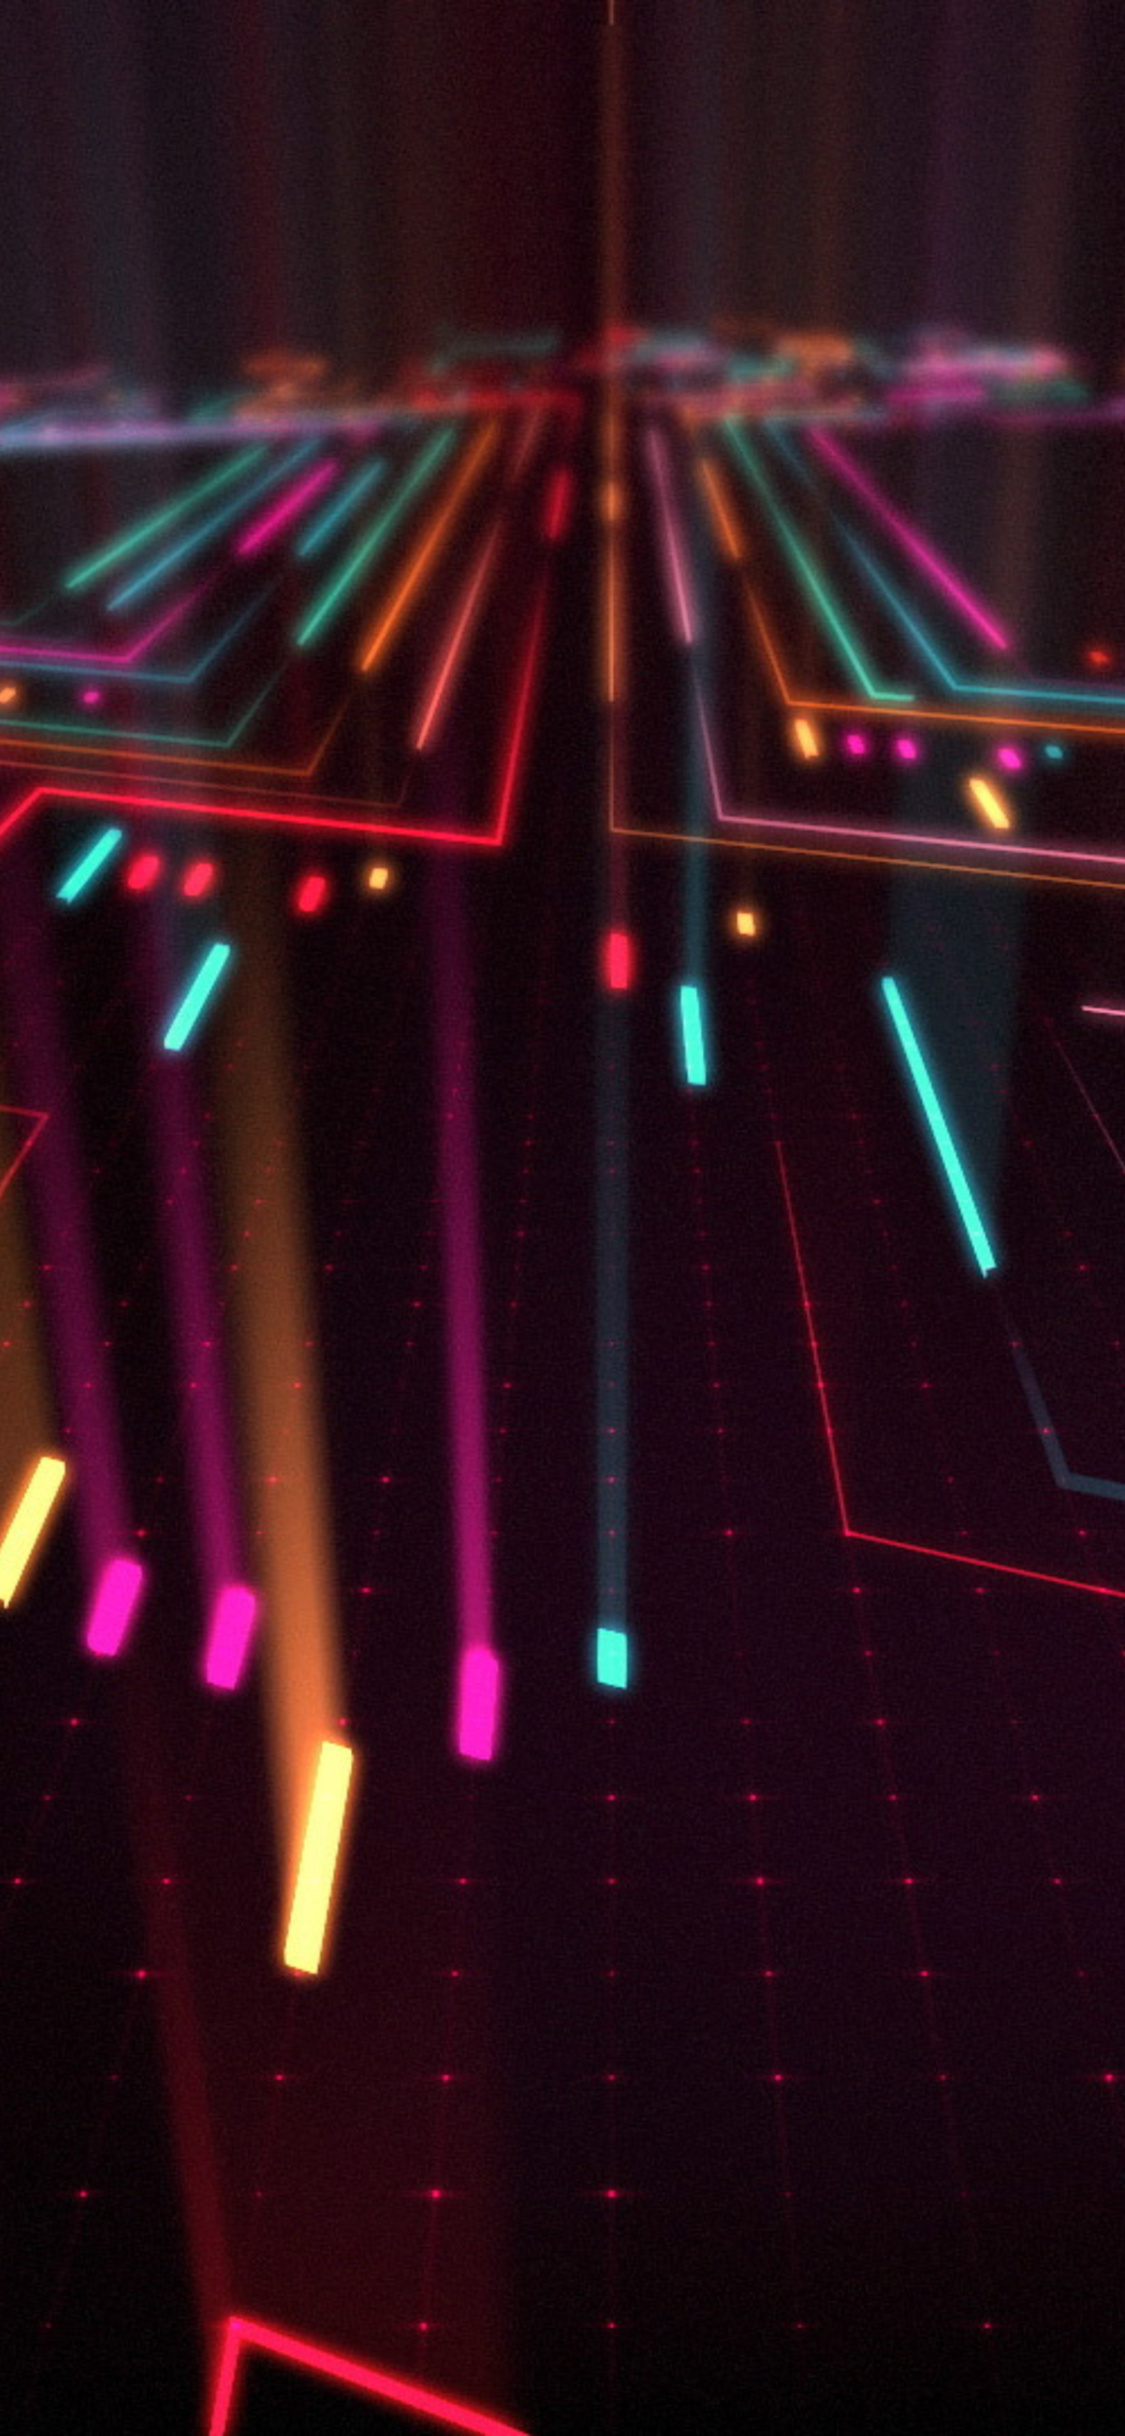 1125x2436 Abstract Neon Digital Art Iphone XS,Iphone 10 ...